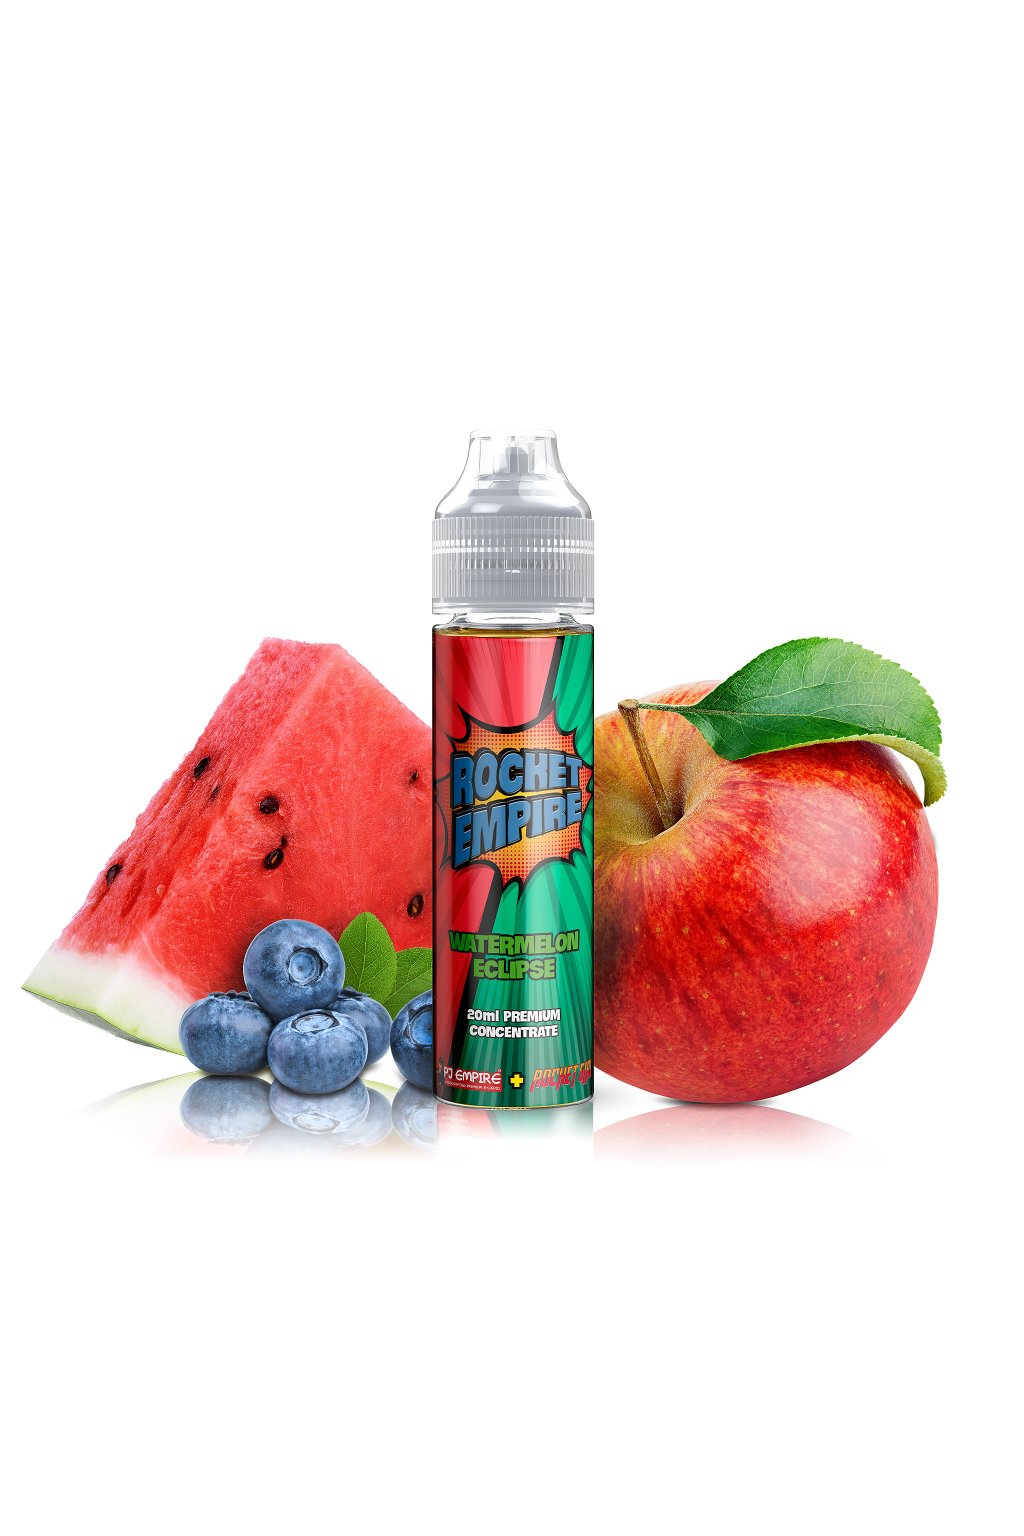 Rocket Empire WatermelonEclipse Fruechtebild SONE